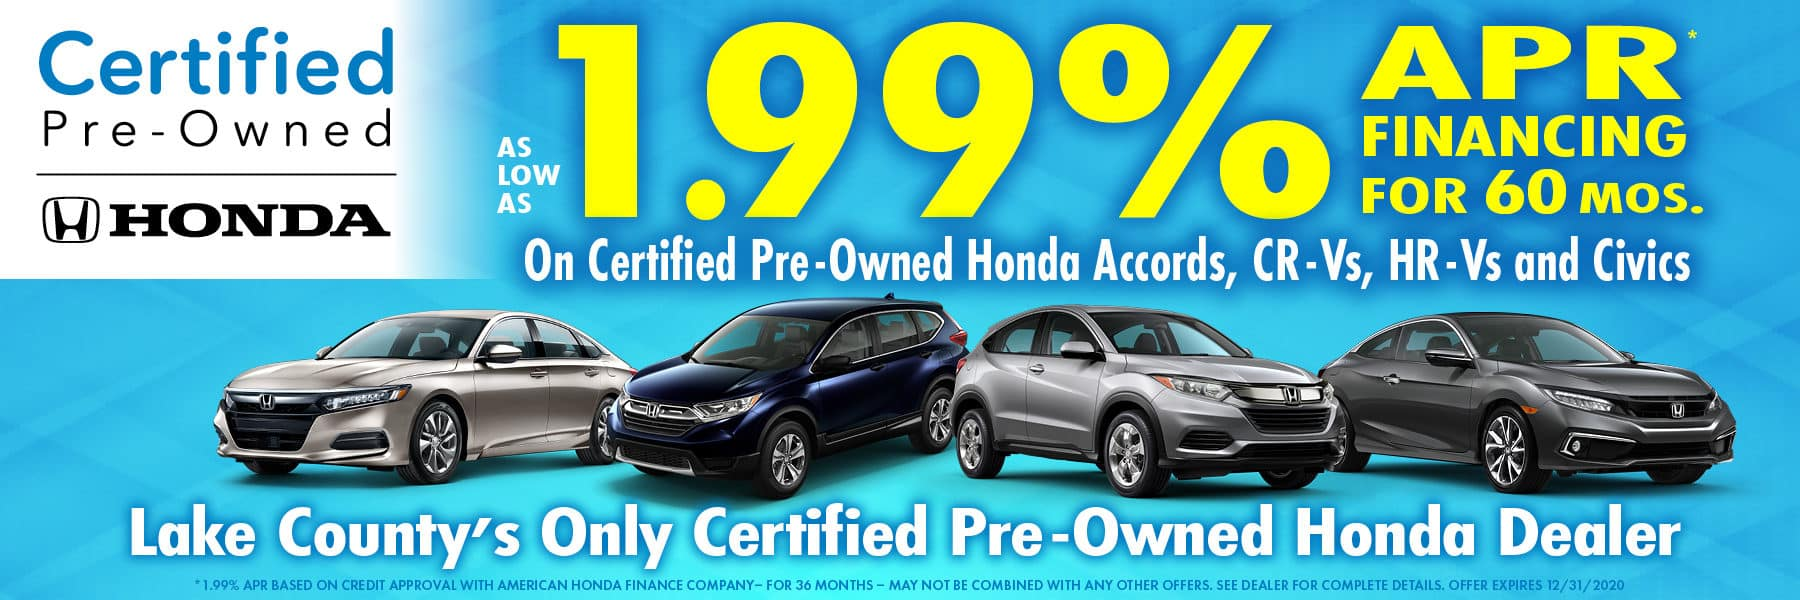 HQHondaCPOv1T3965 HQ Honda Certified 1800×600